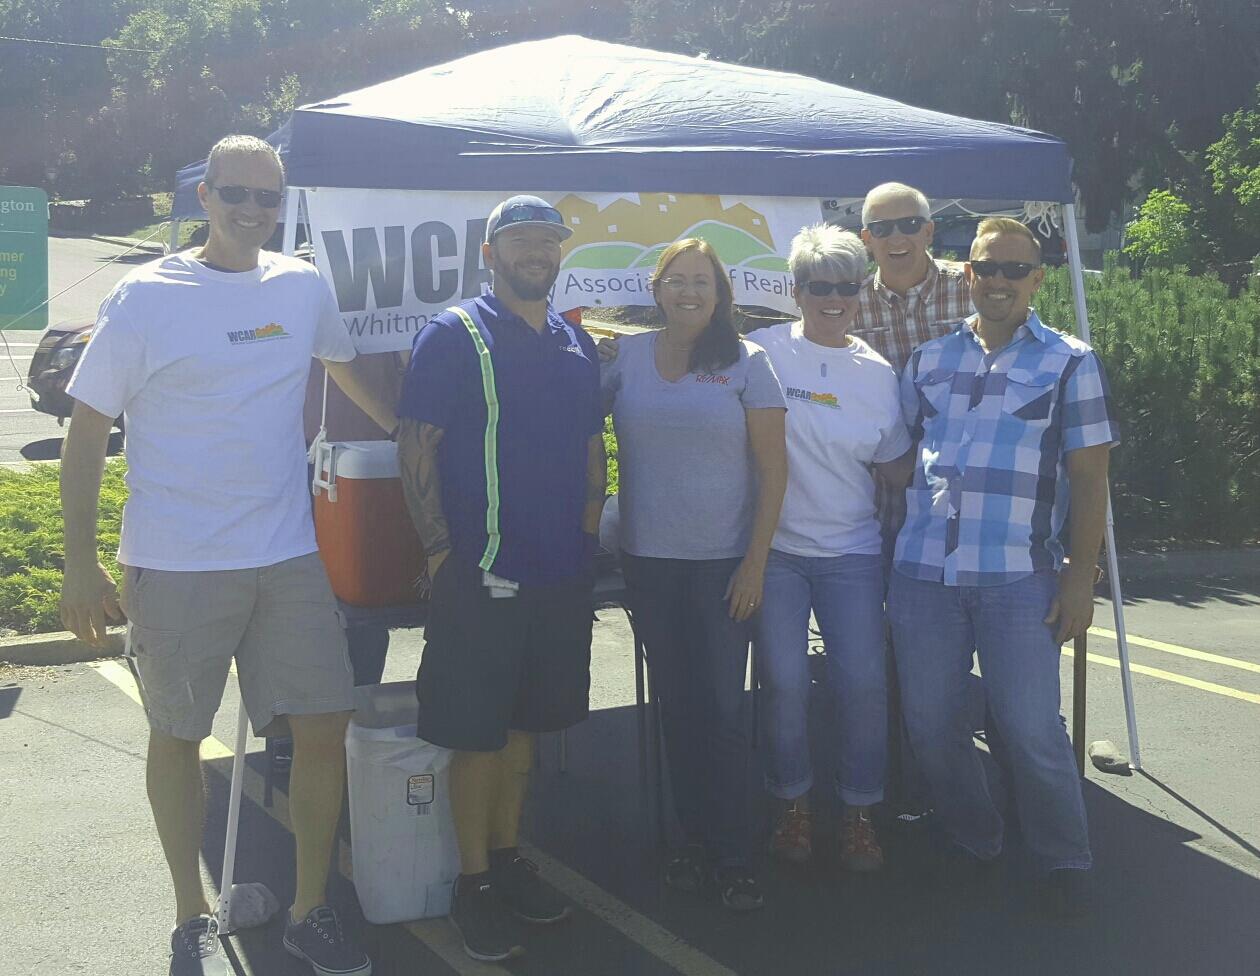 WCAR Shred Day Volunteers: Joe Pitzer, Mr. Shred Guy, Kris finch, Lynda Darnell, Keith Kincaid & Jeff Baldwin. Not pictured: Alan Hodges & Amy Honeywell.